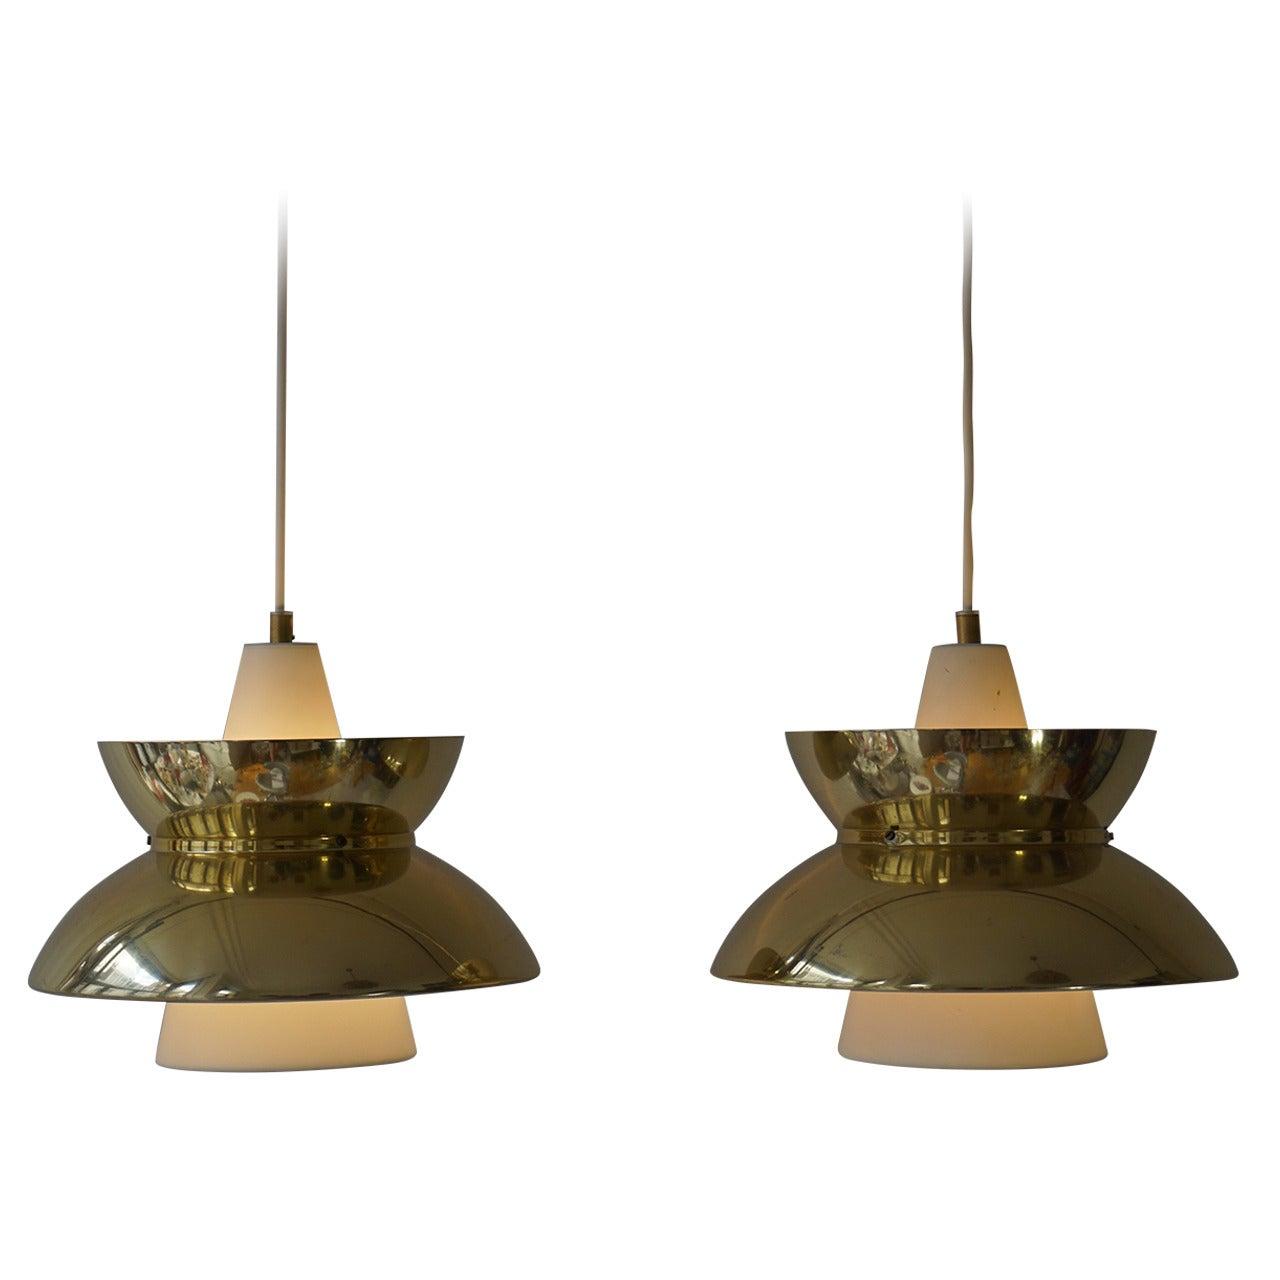 Set of Five Midcentury Pendant Lights by Jørn Utzon